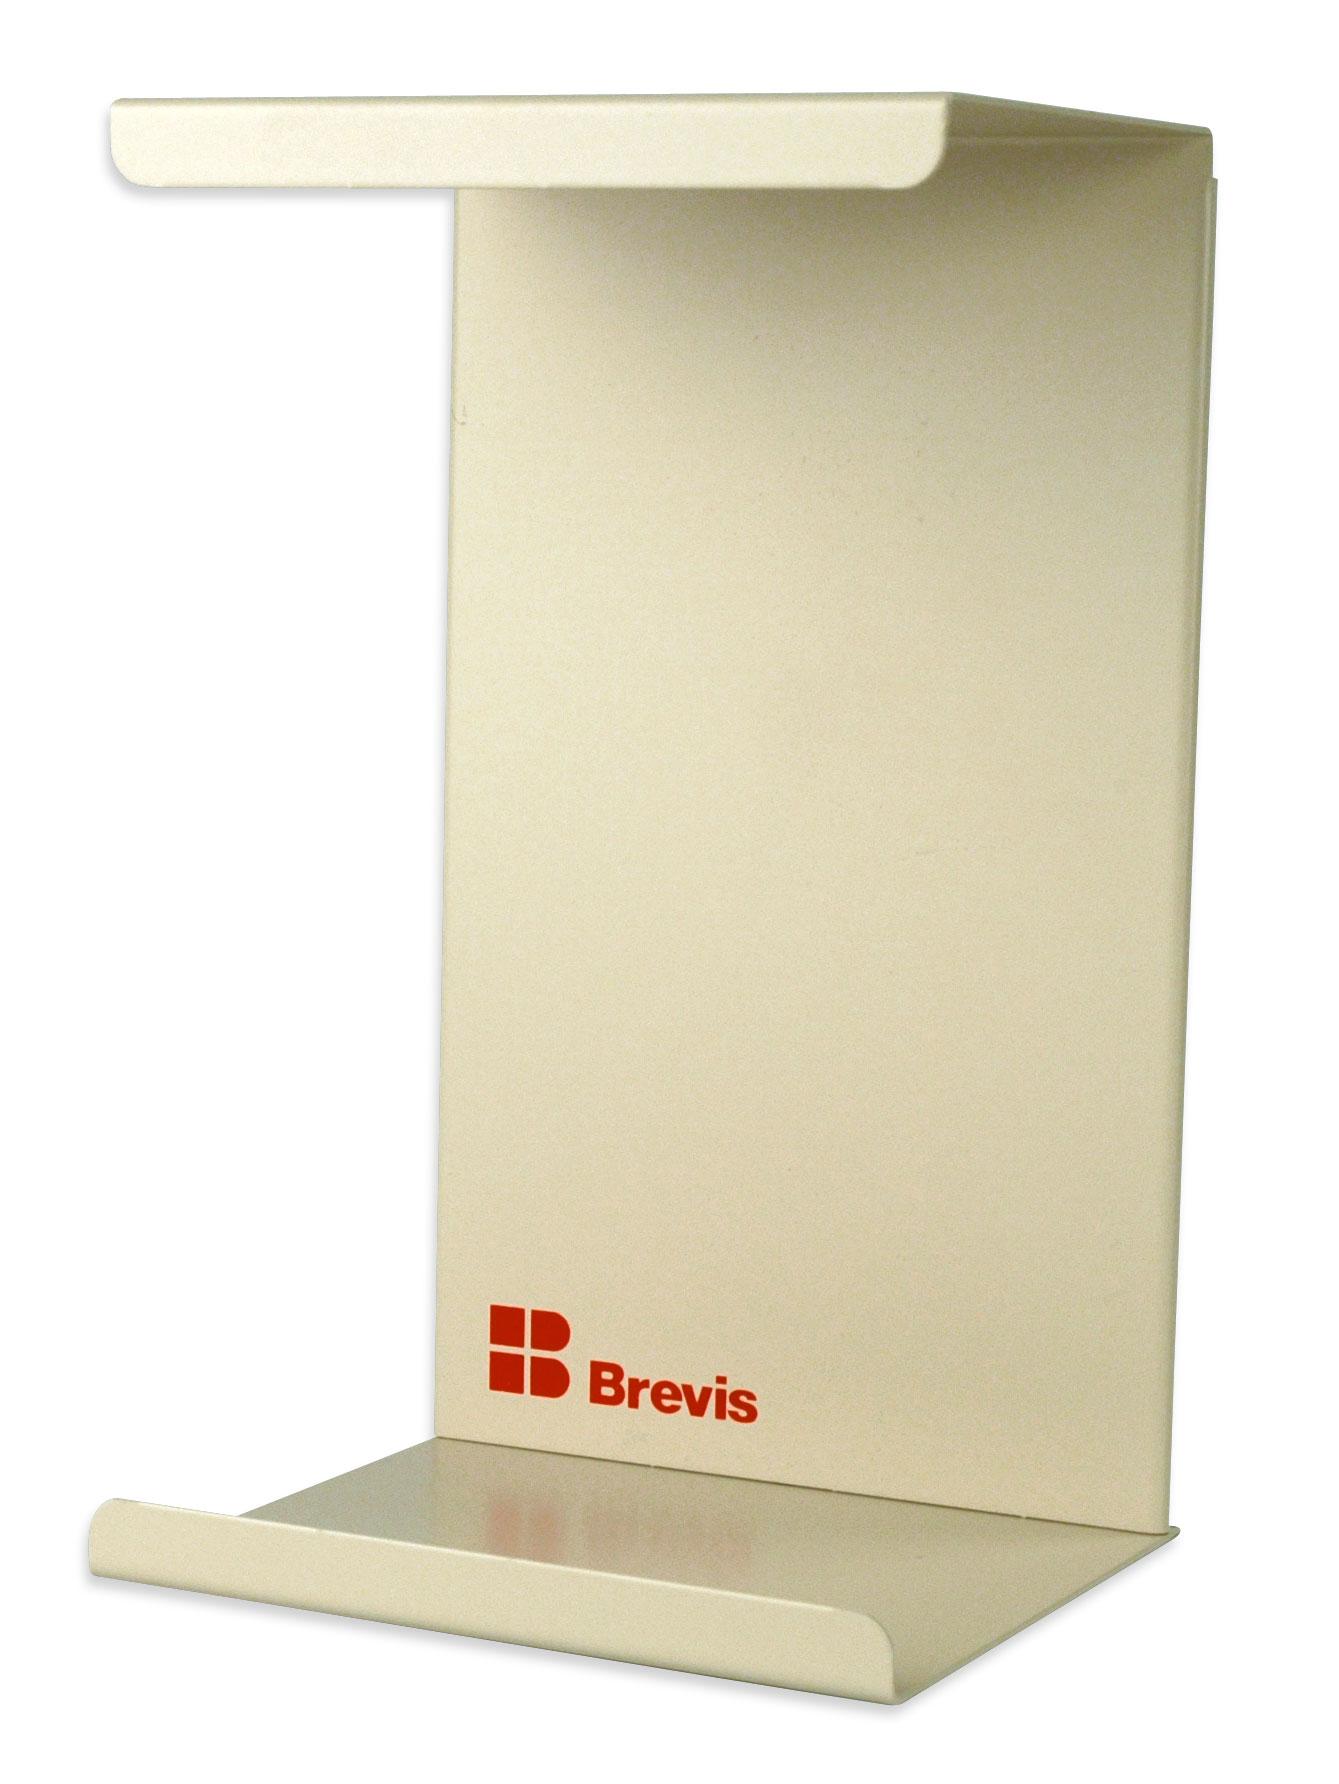 Brevispenser Adjustable Glove Dispenser Bracket Brevis